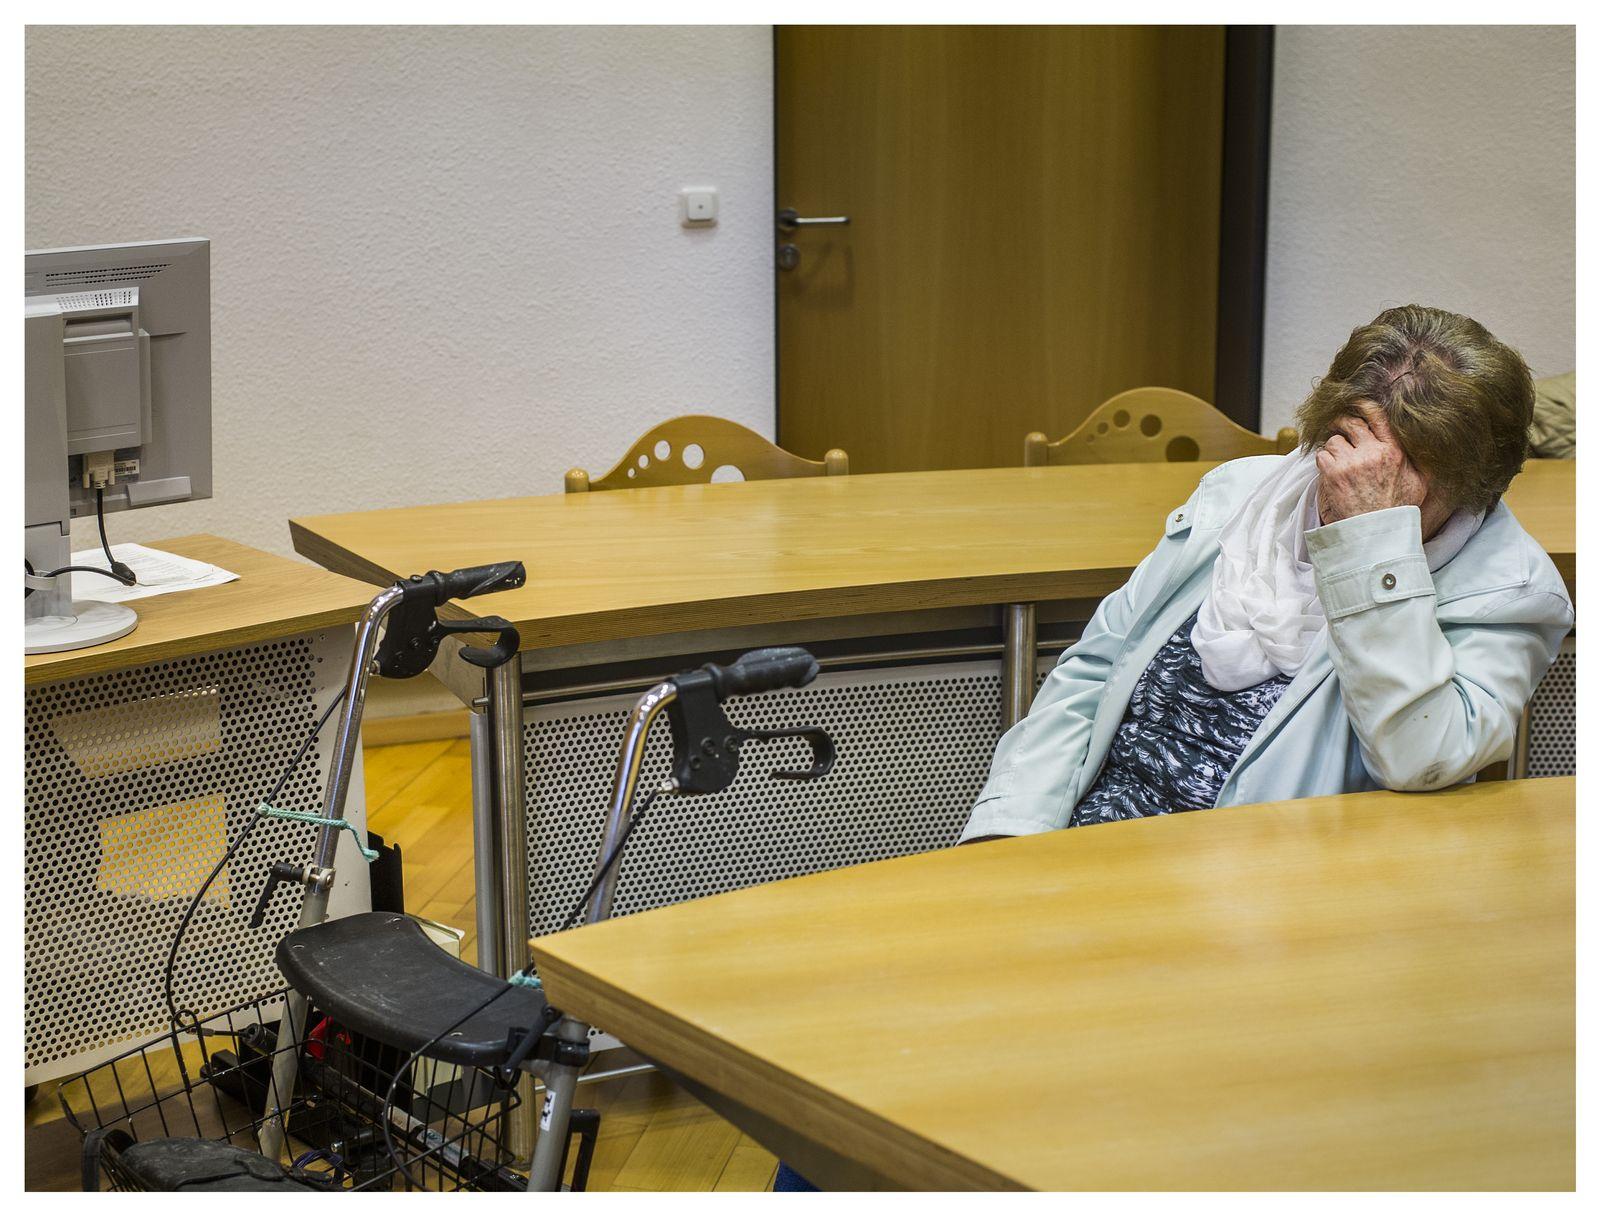 EINMALIGE VERWENDUNG Prozess/ Marie Luise Christina Stoeppler/ Amtsgericht Alsfeld